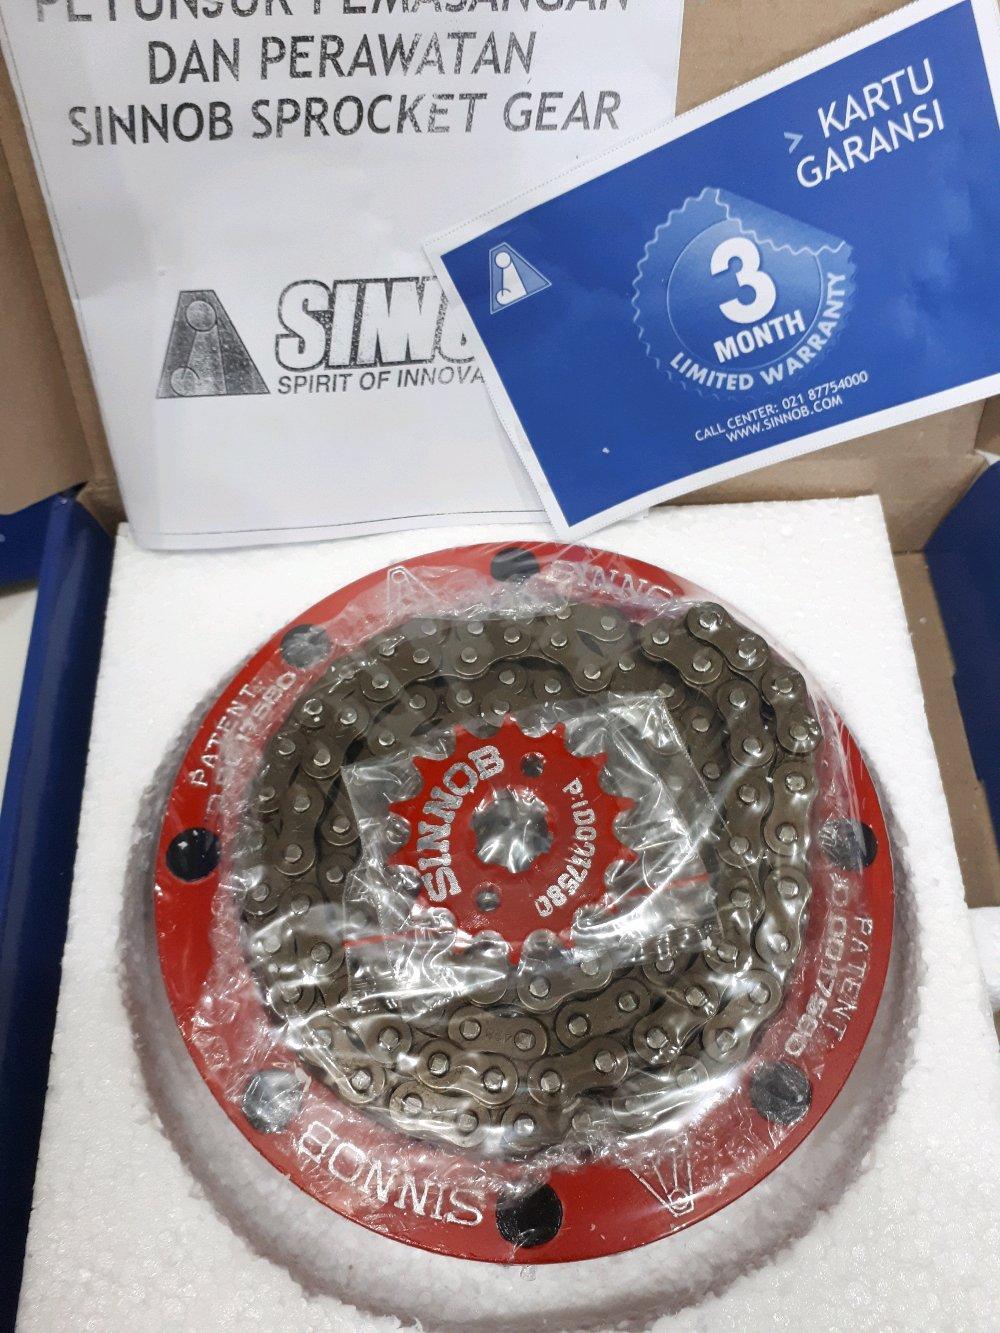 Harga Jual Honda Cbr150r Murah All New Cbr 150r Victory Black Red Banyumas Gear Set Sinnob Thailand 150 R Old Lama Th